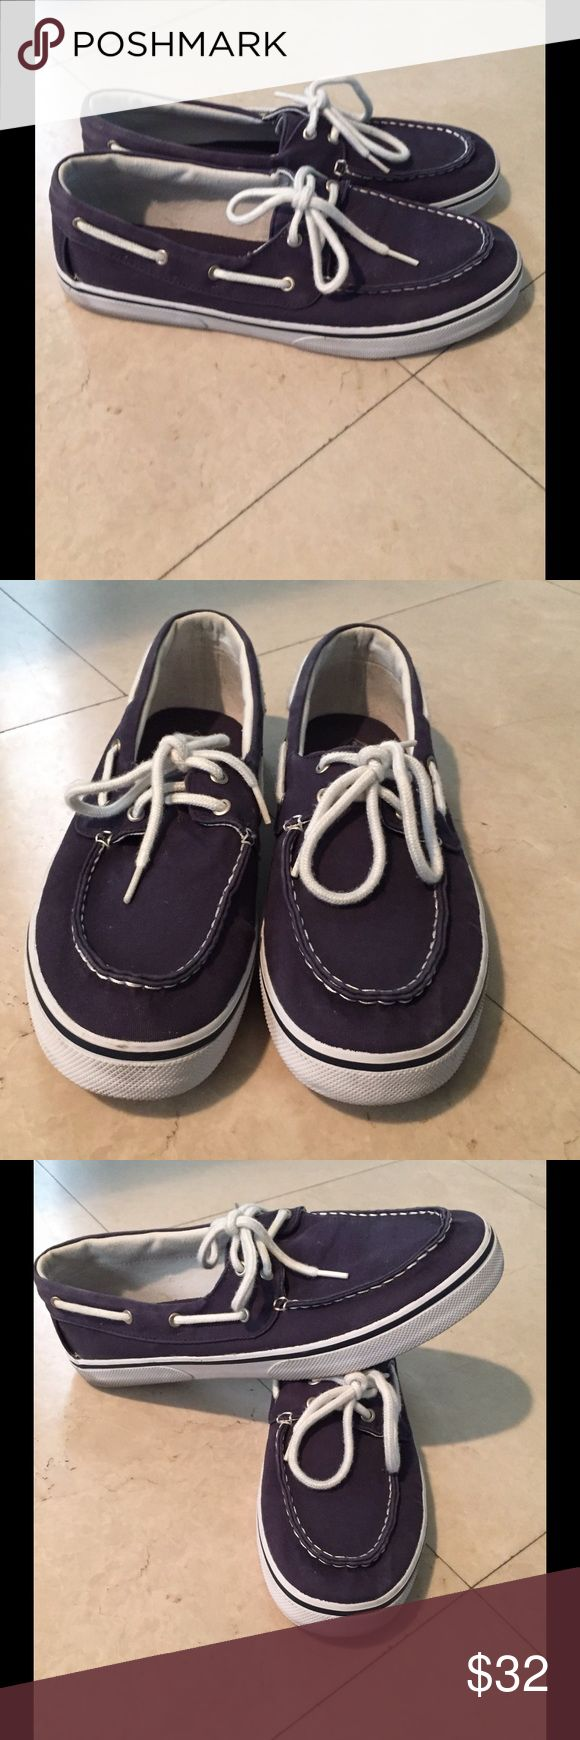 Men's Blue Boat Shoes Men's Blue Boat Shoes Shoes